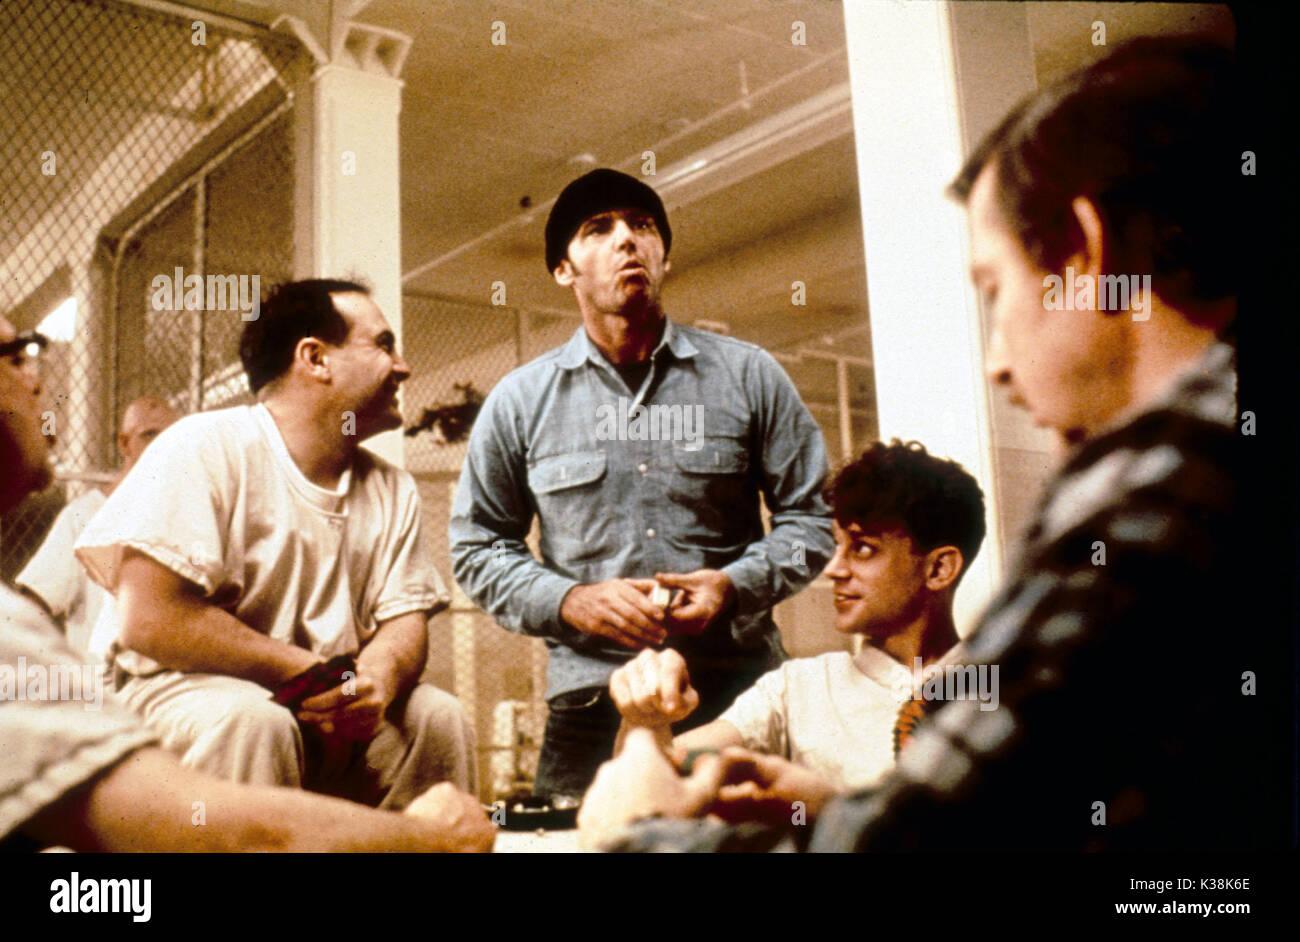 ONE FLEW OVER THE CUCKOO'S NEST [US 1975]  Danny DeVito, Jack Nicholson, Brad Dourif     Date: 1975 - Stock Image